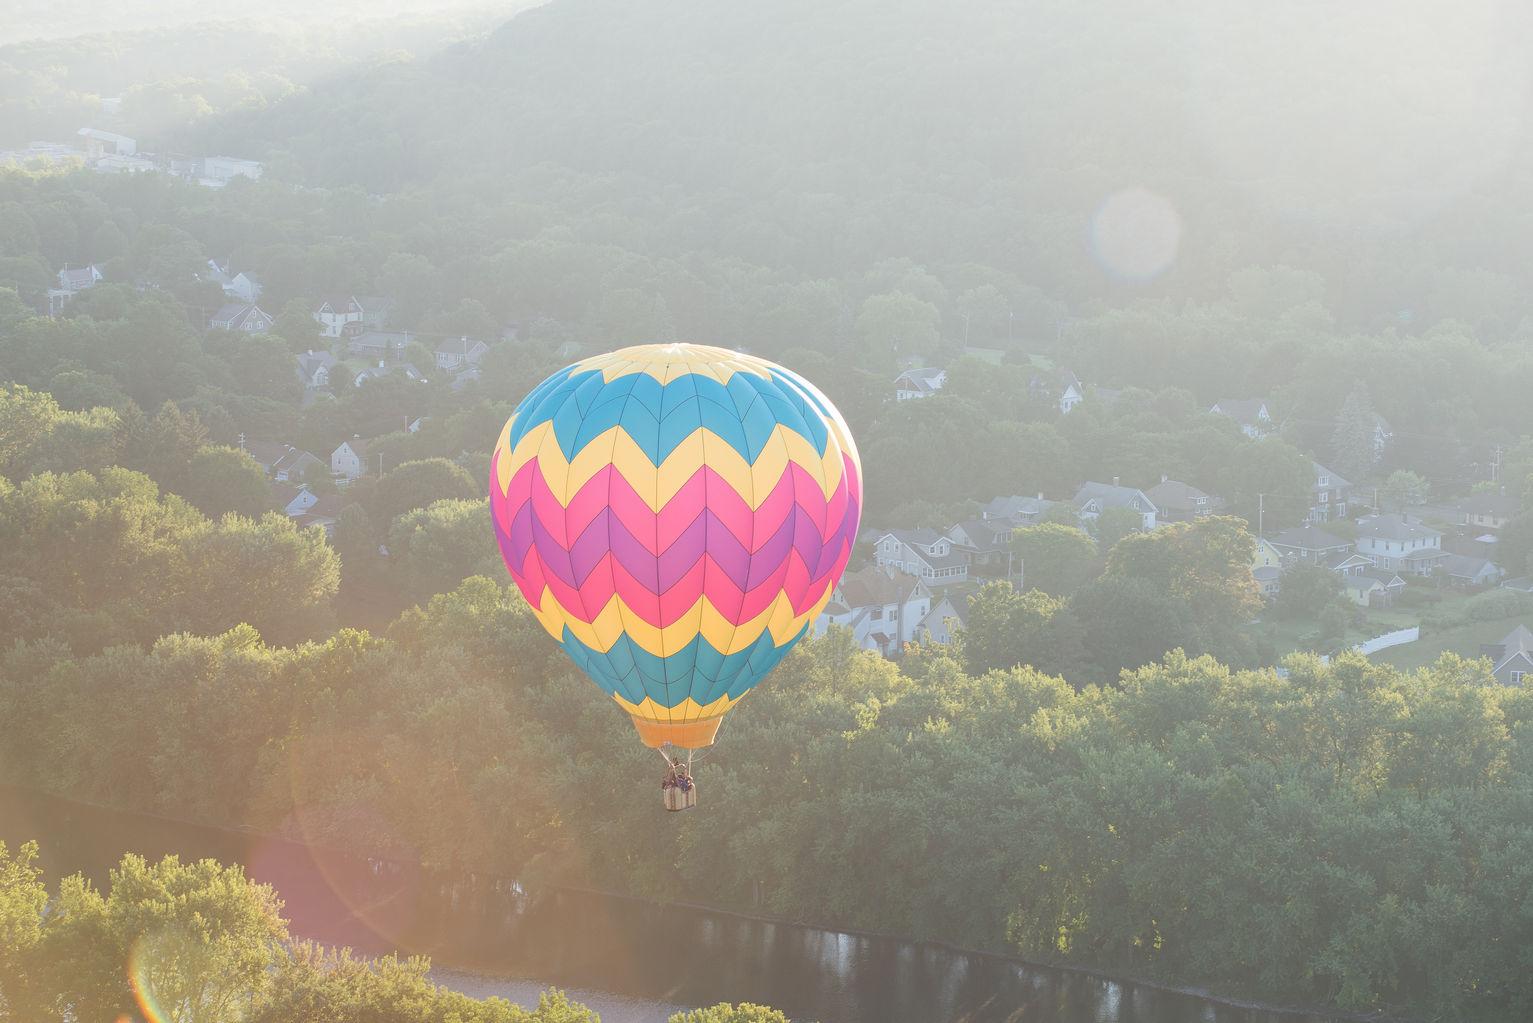 Hot air balloon ride at spiedie festival in binghamton new york